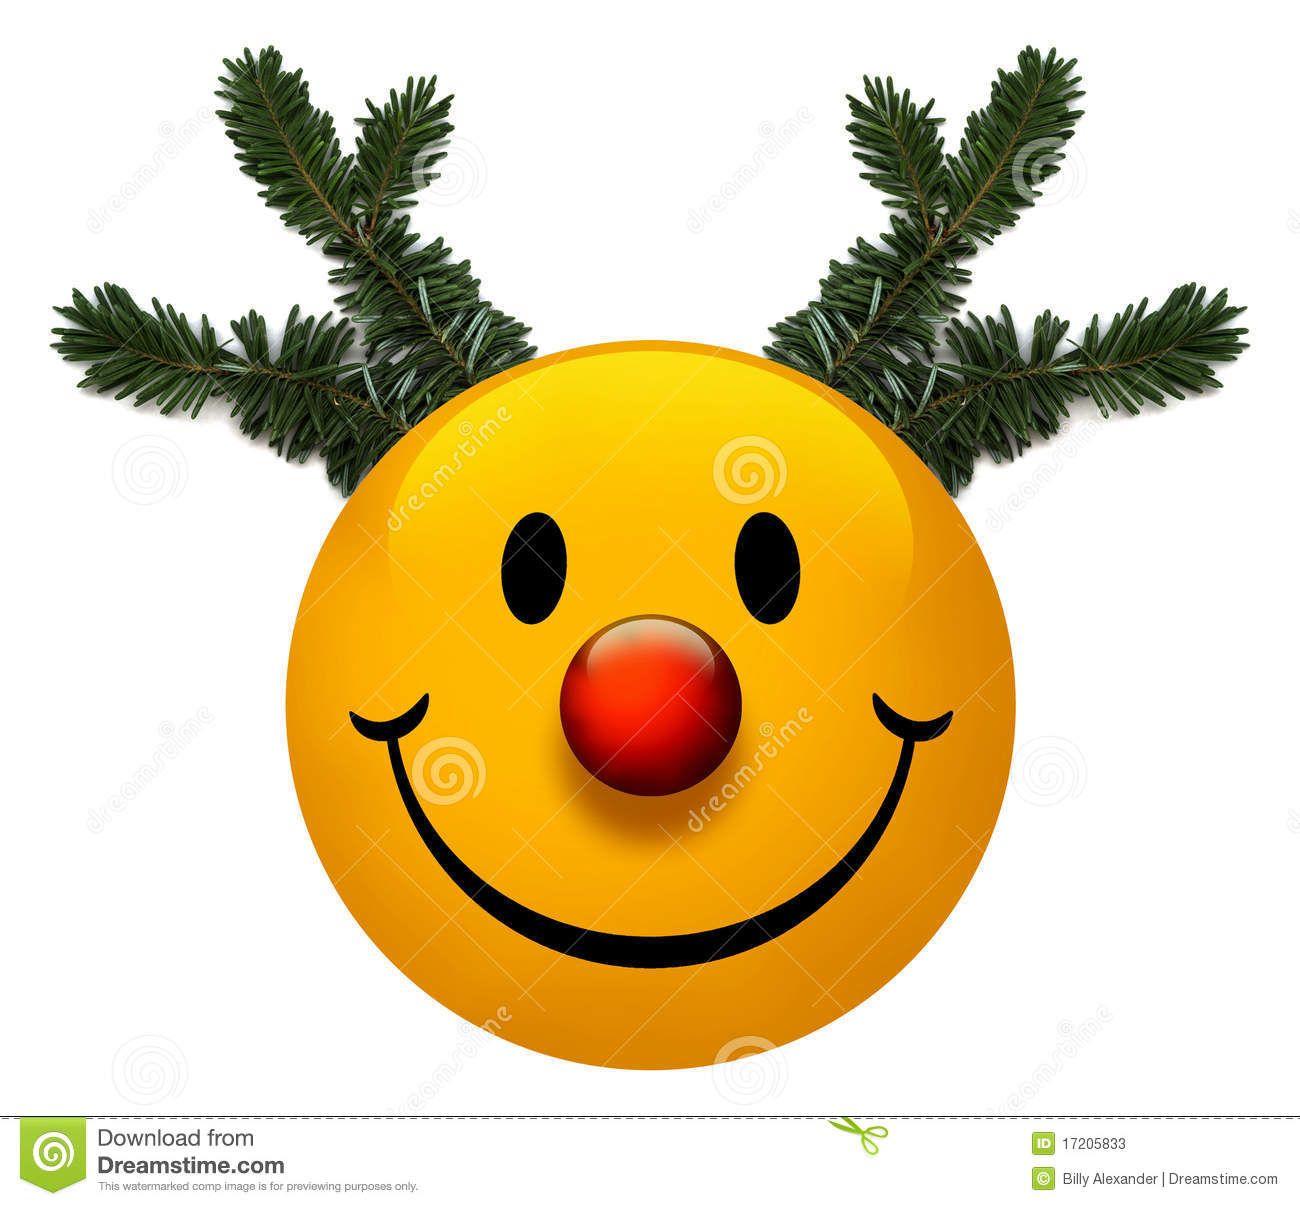 Smiley Holiday Icon 17205833 Jpg 1300 1206 Smiley Holiday Icon Smiley Face